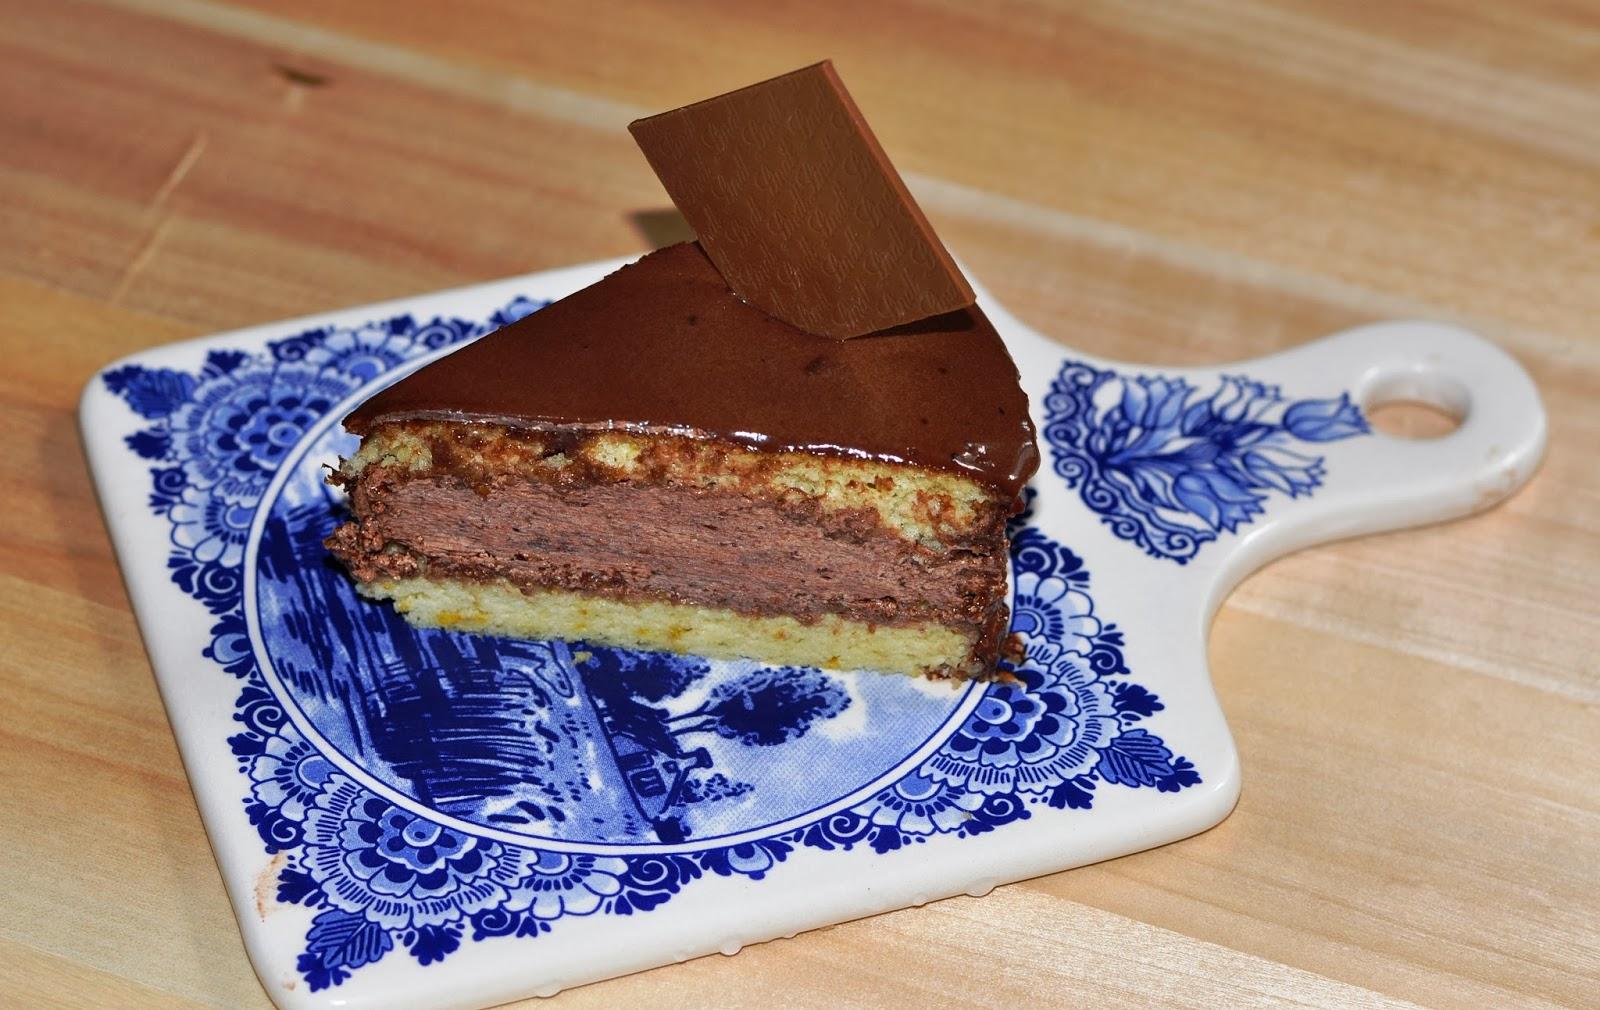 Chocolate Sponge Cake Recipe That Rises Well